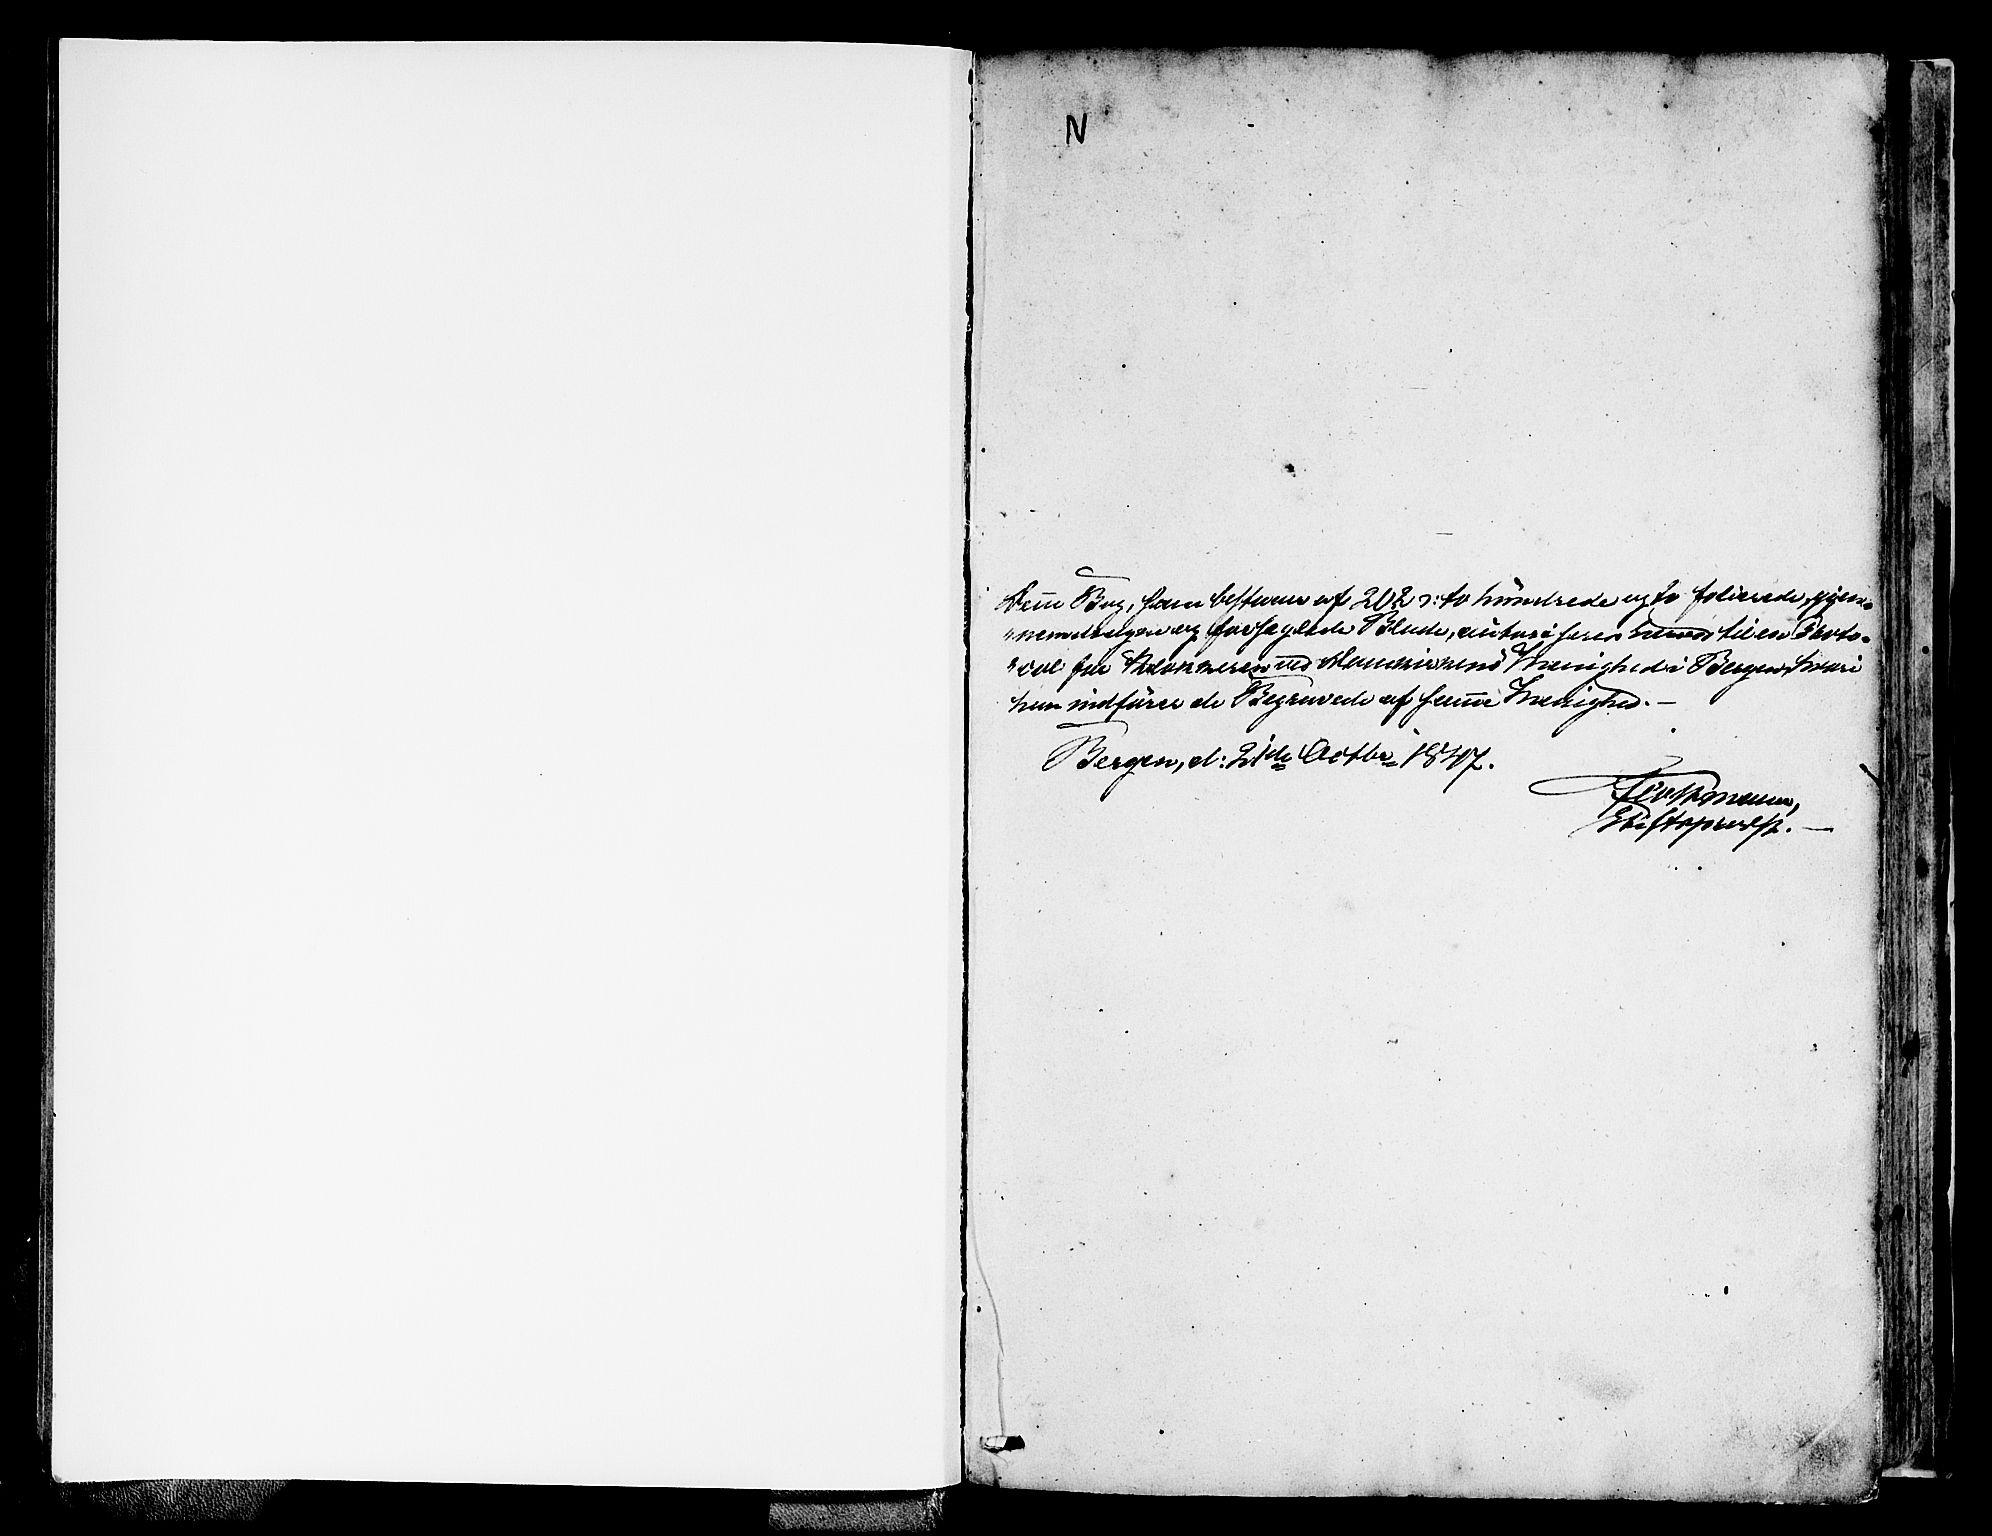 SAB, Domkirken Sokneprestembete, H/Hab/L0038: Klokkerbok nr. E 2, 1847-1859